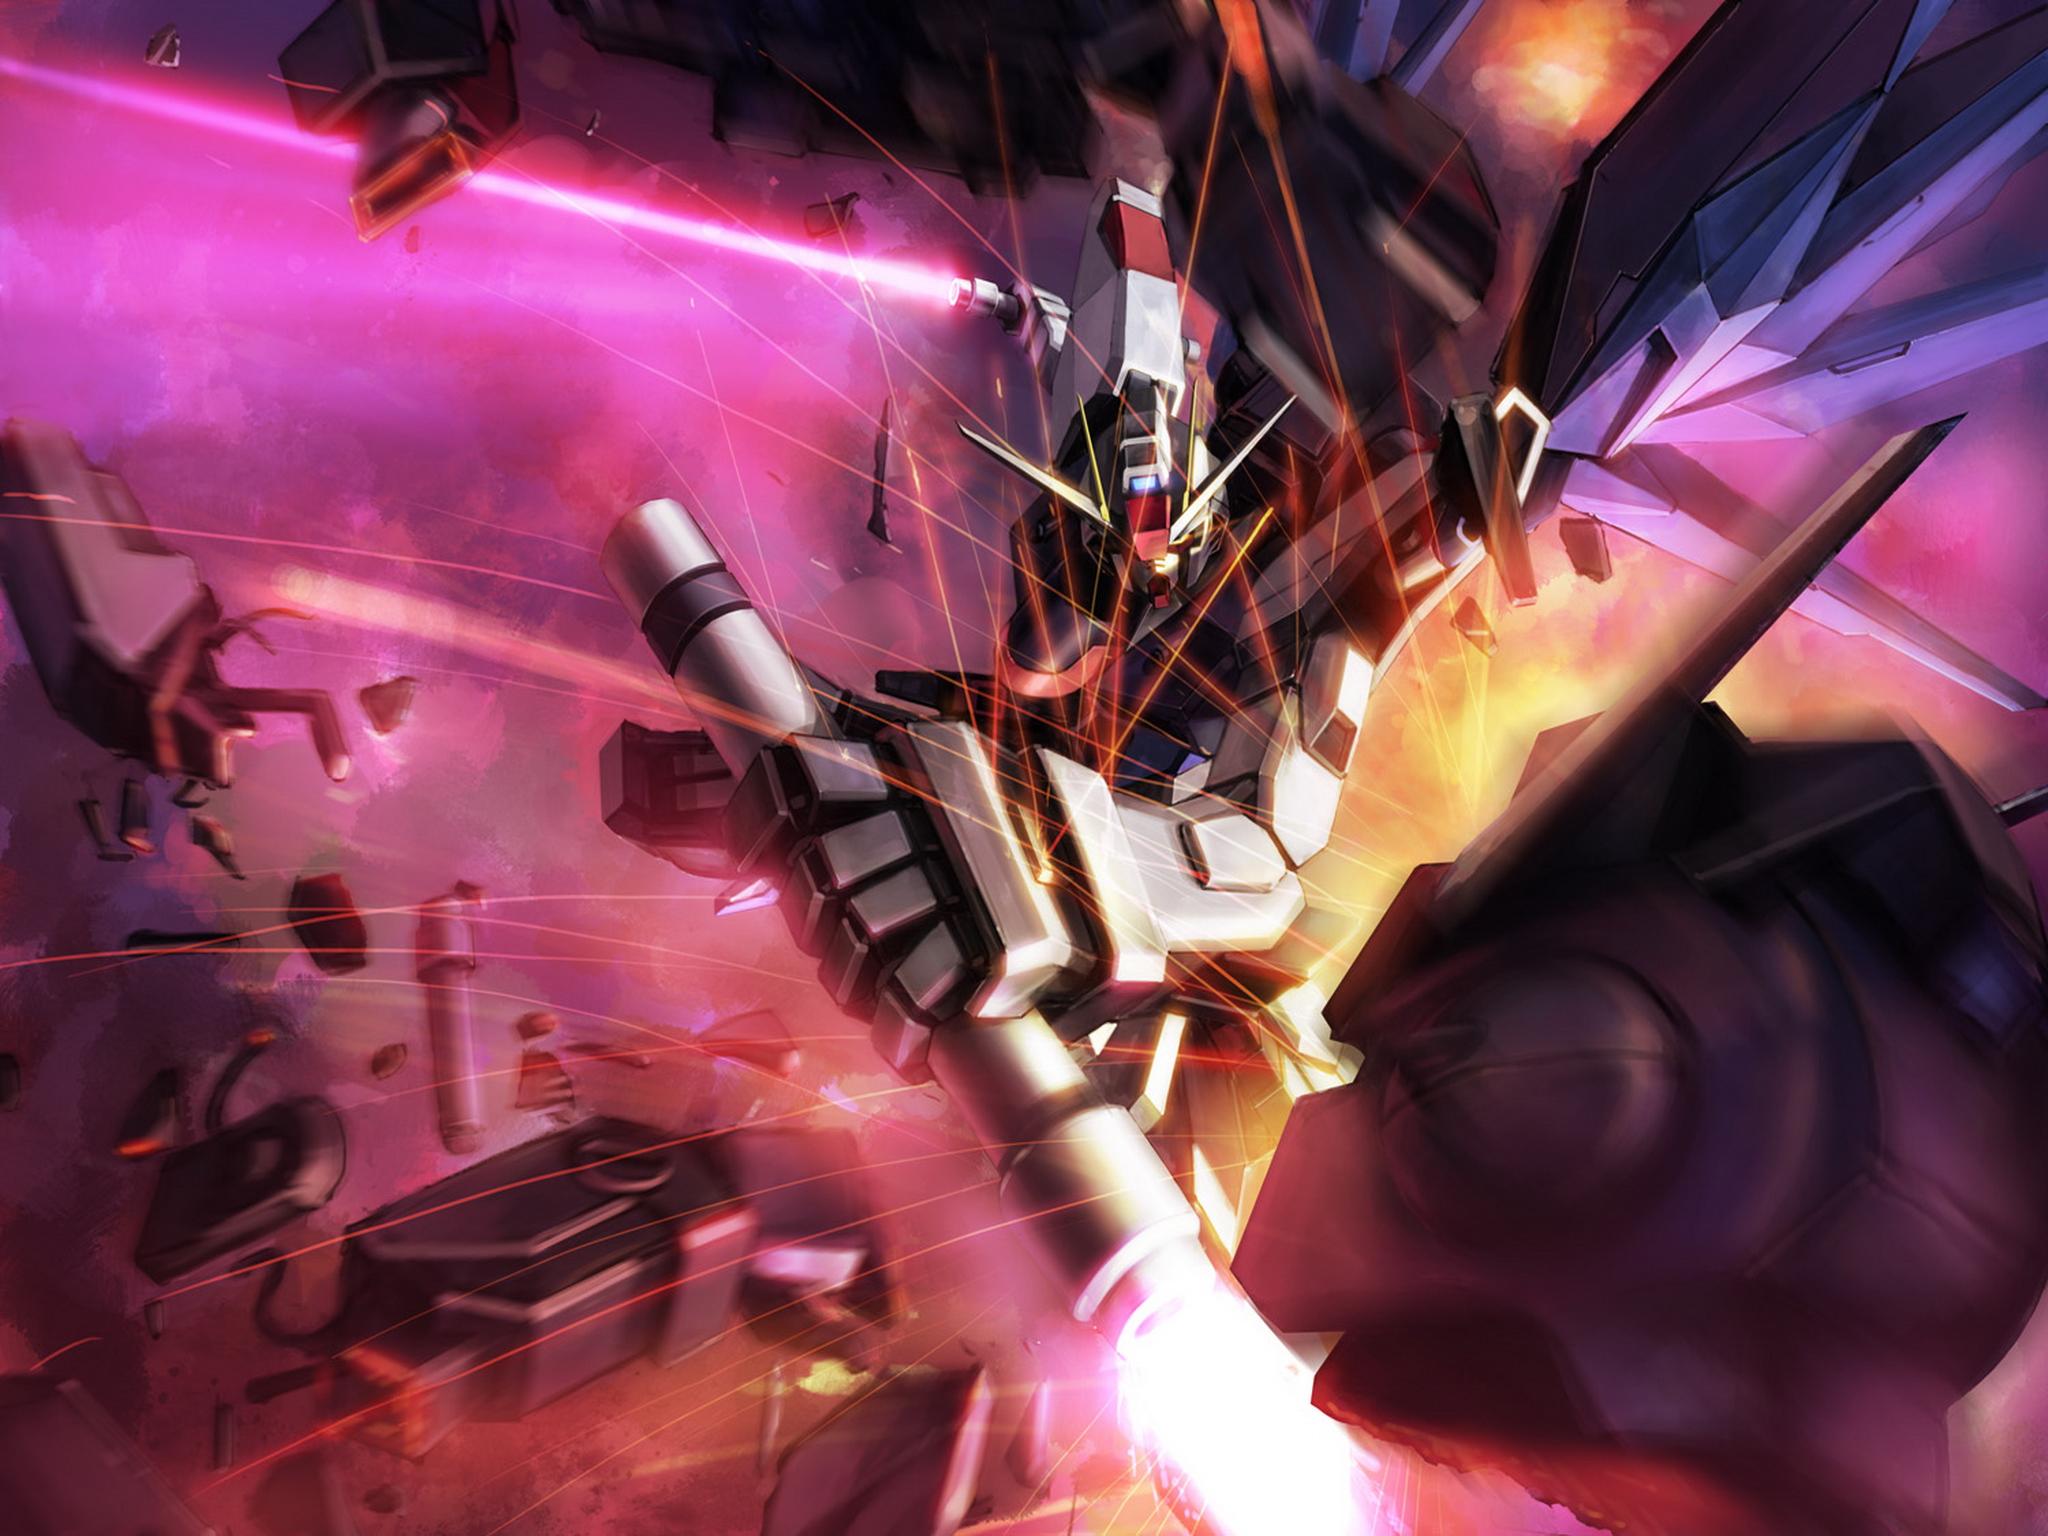 Gundam iPad 3 Wallpaper New iPad 34 20481536 Wallpapers Photos 2048x1536